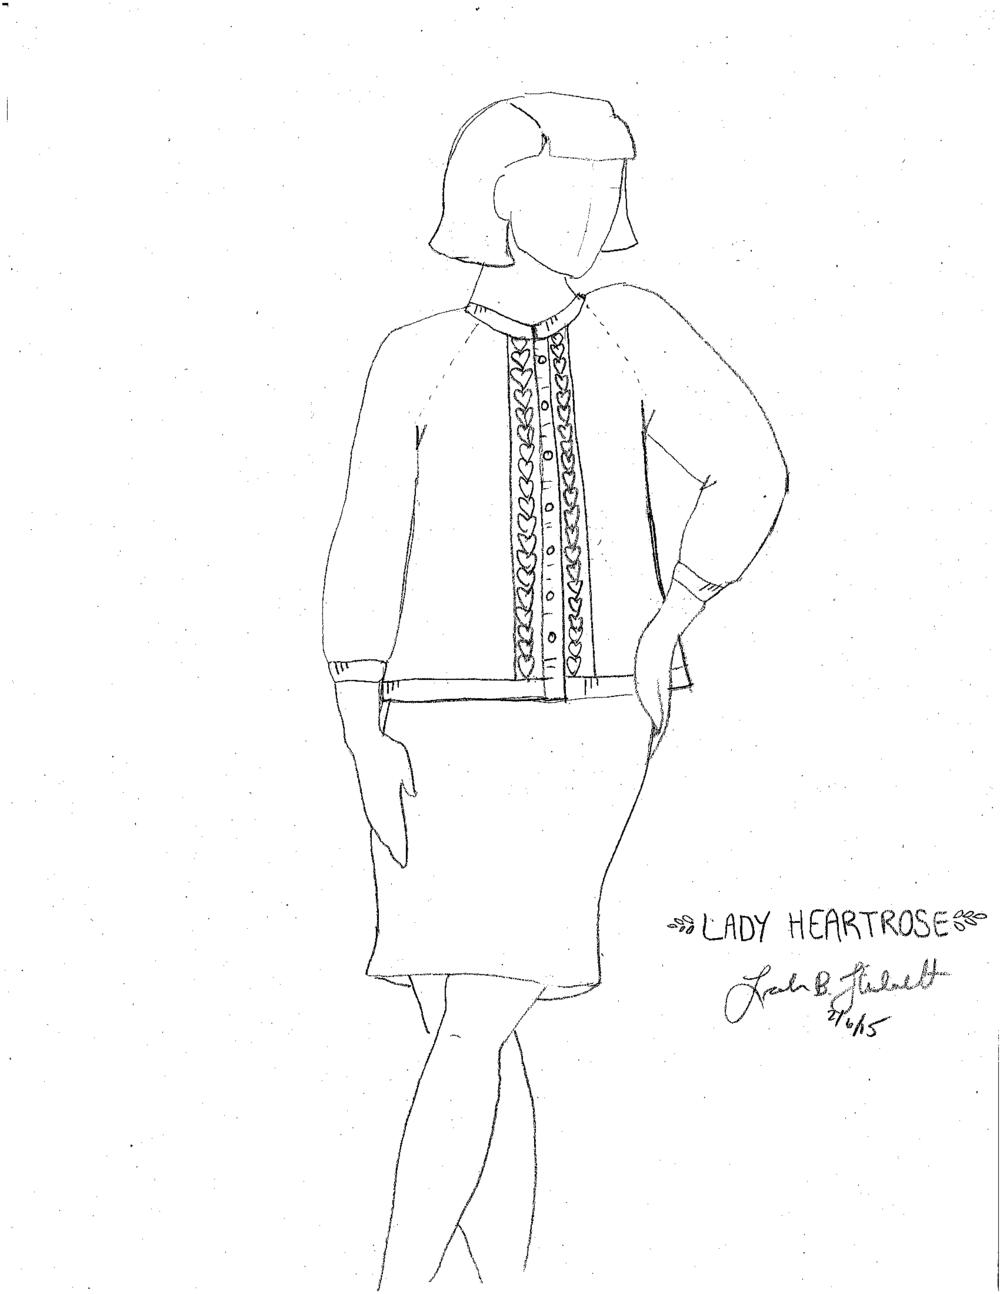 Lady Heartrose